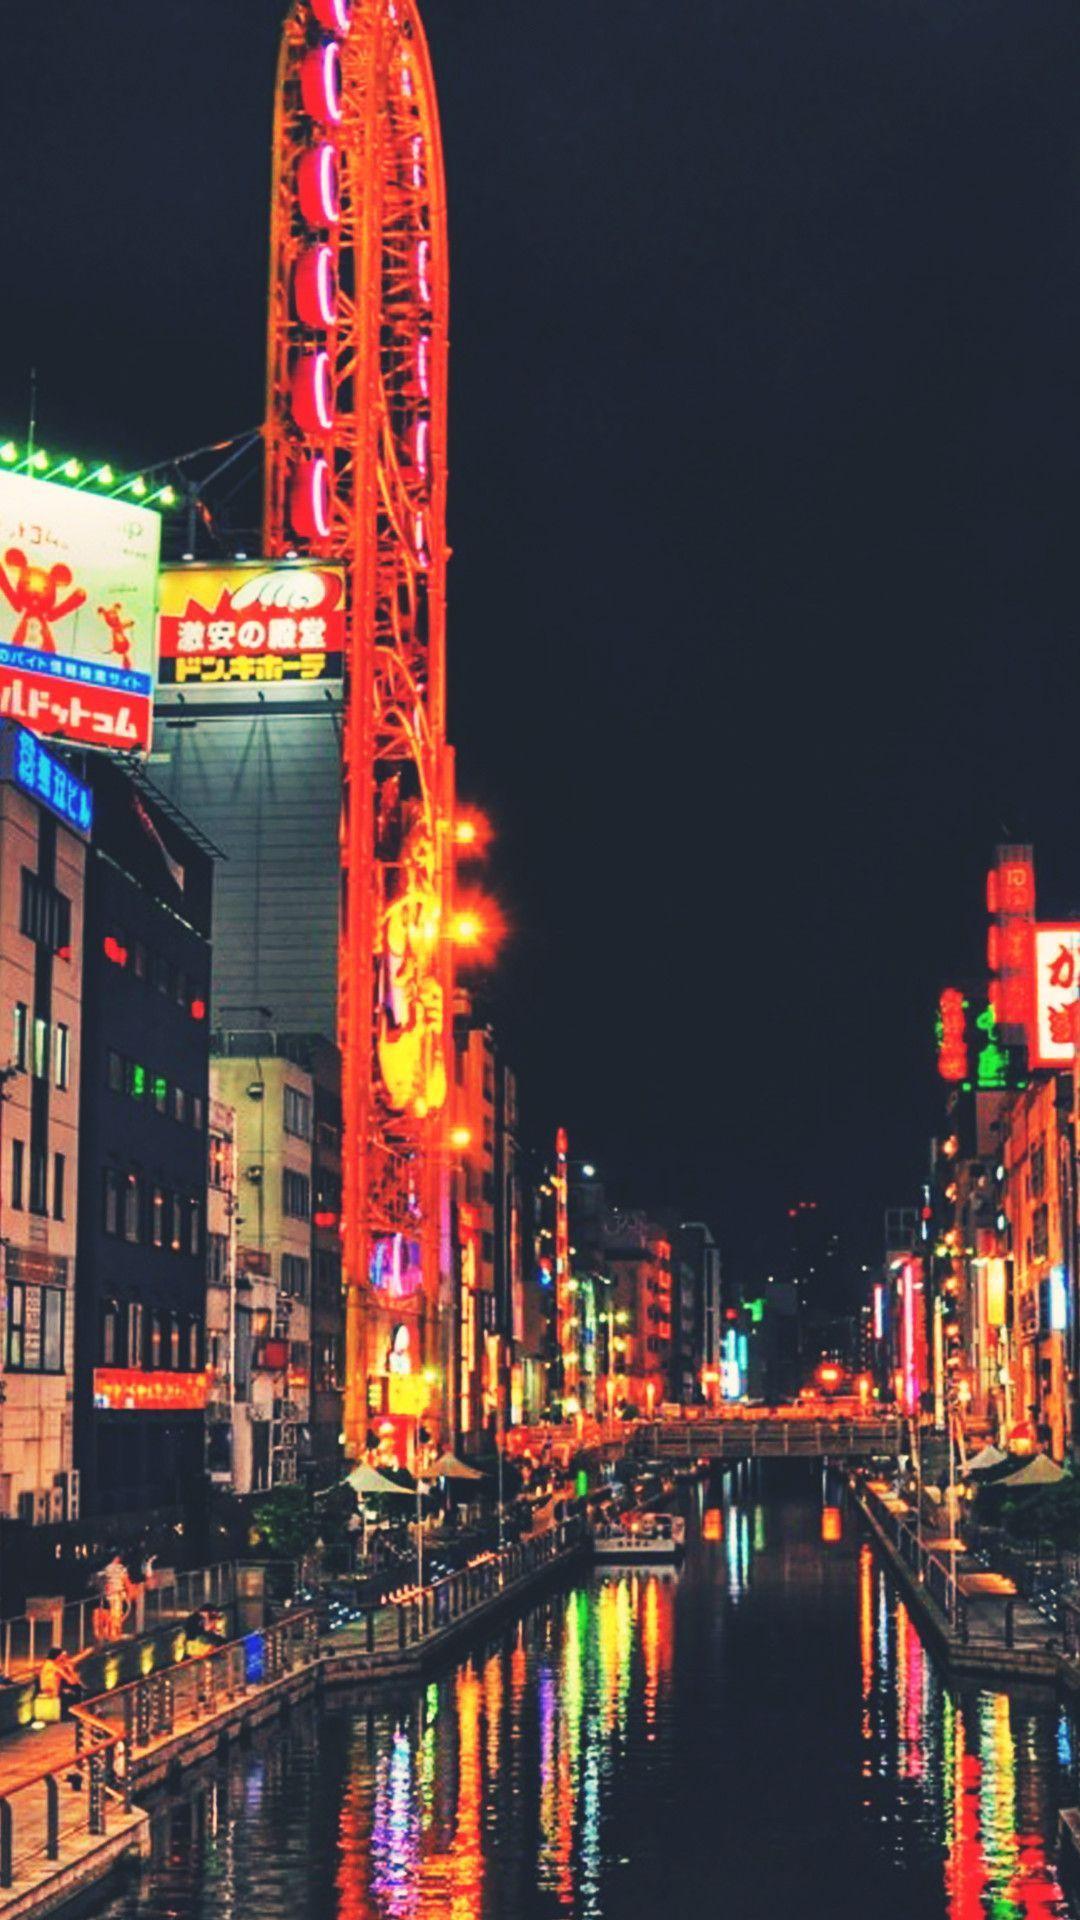 Tokyo Street Iphone Wallpapers Top Free Tokyo Street